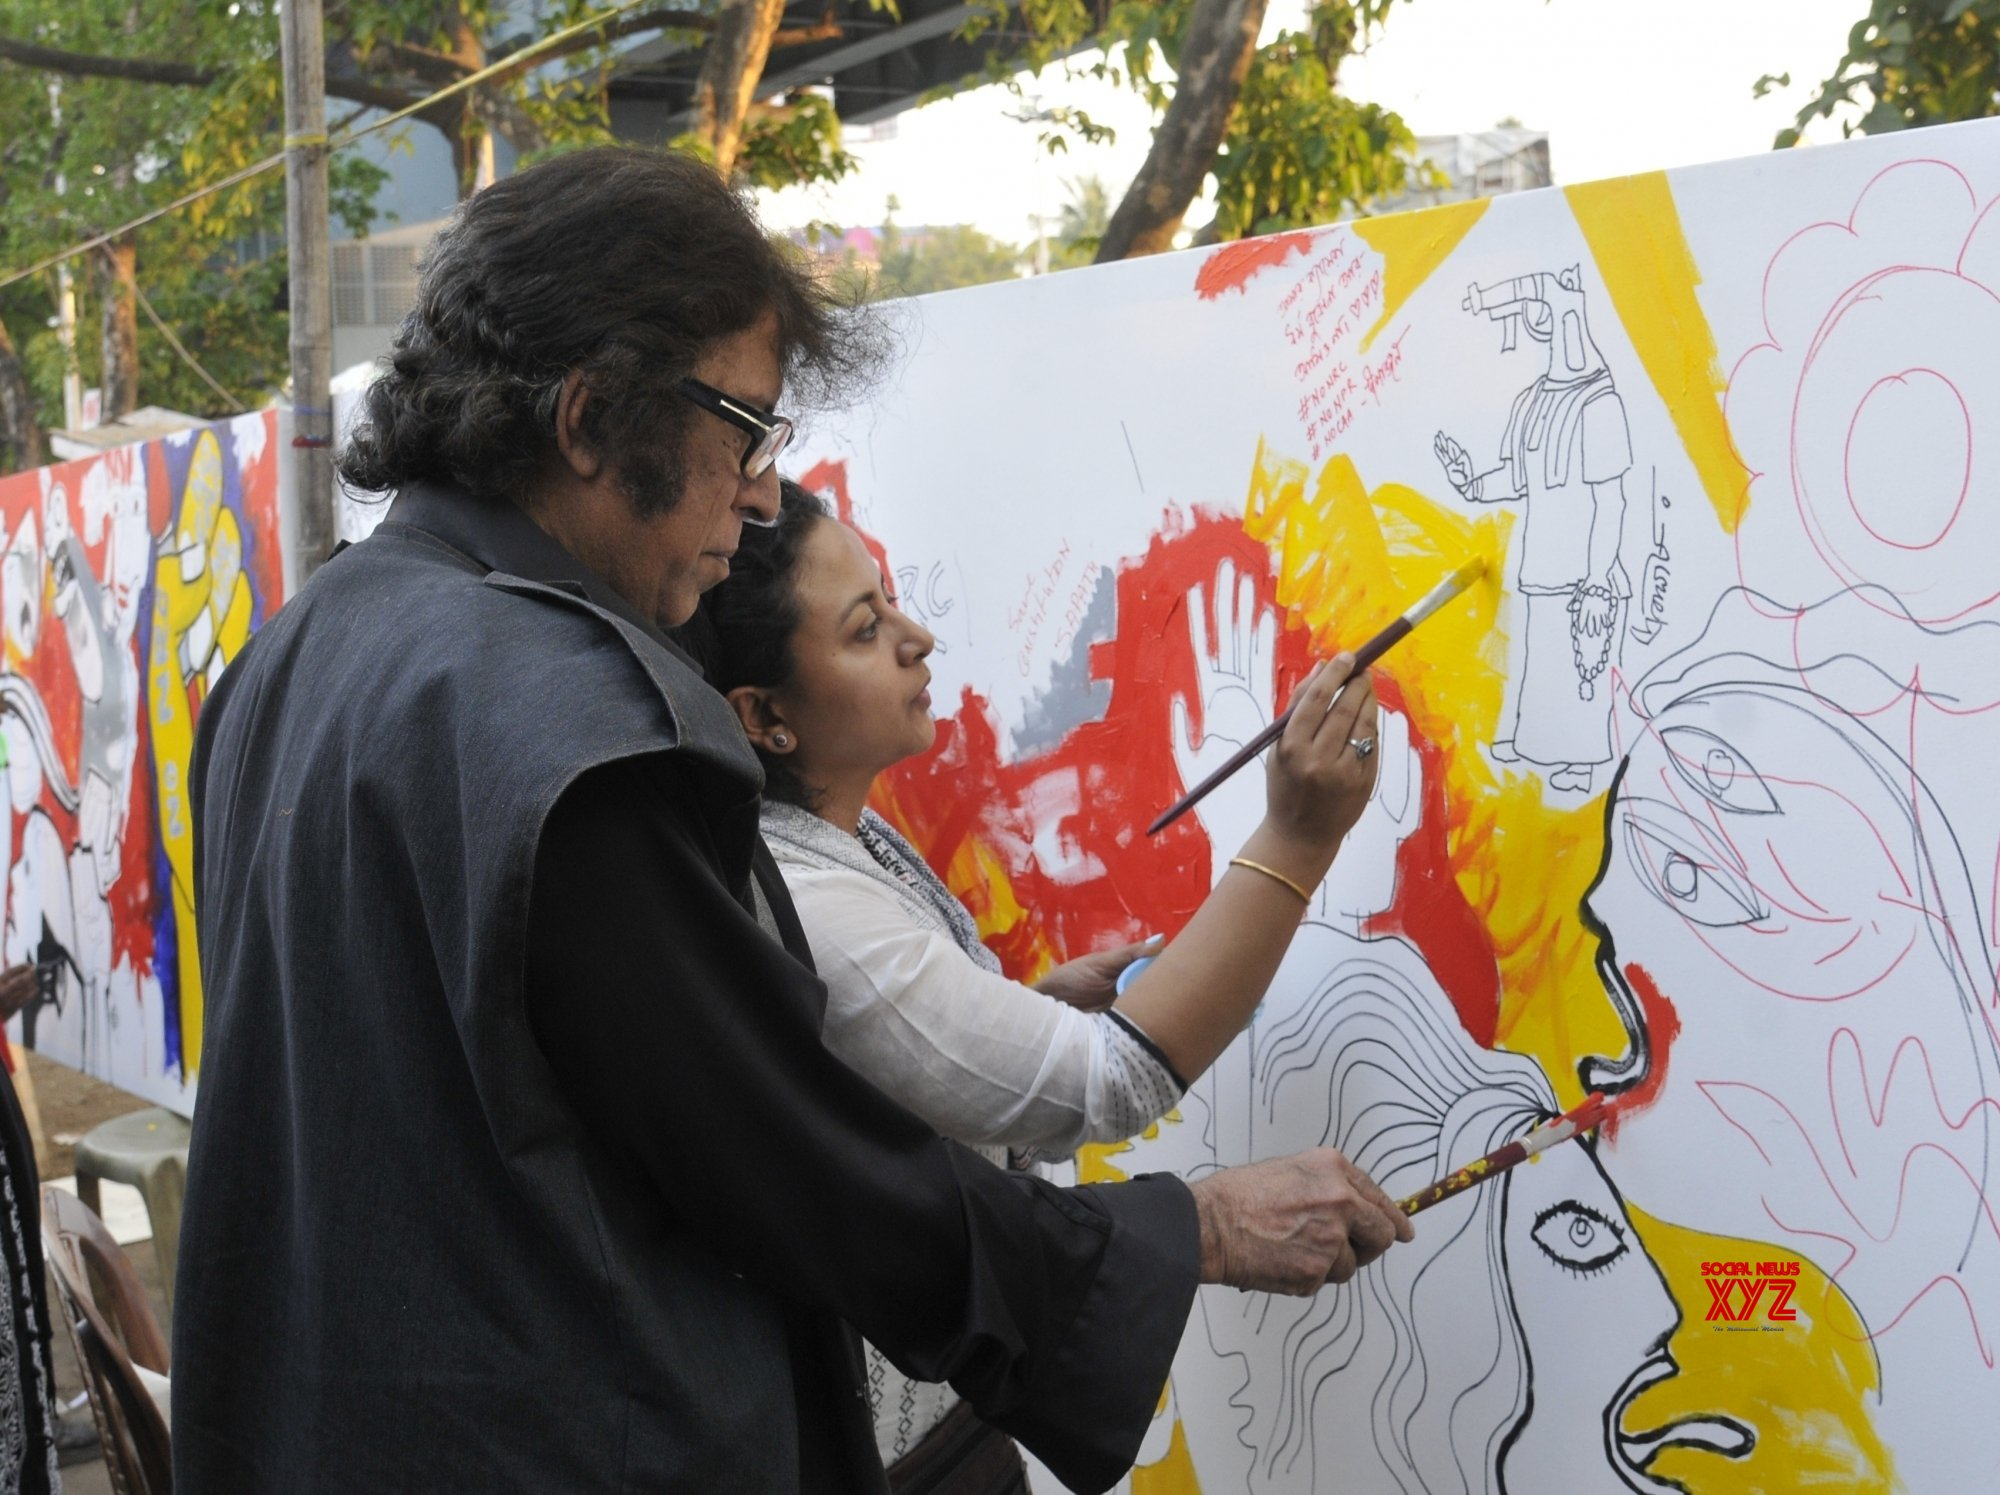 Kolkata: Painter Wasim Kapoor protests against CAA, NRC #Gallery